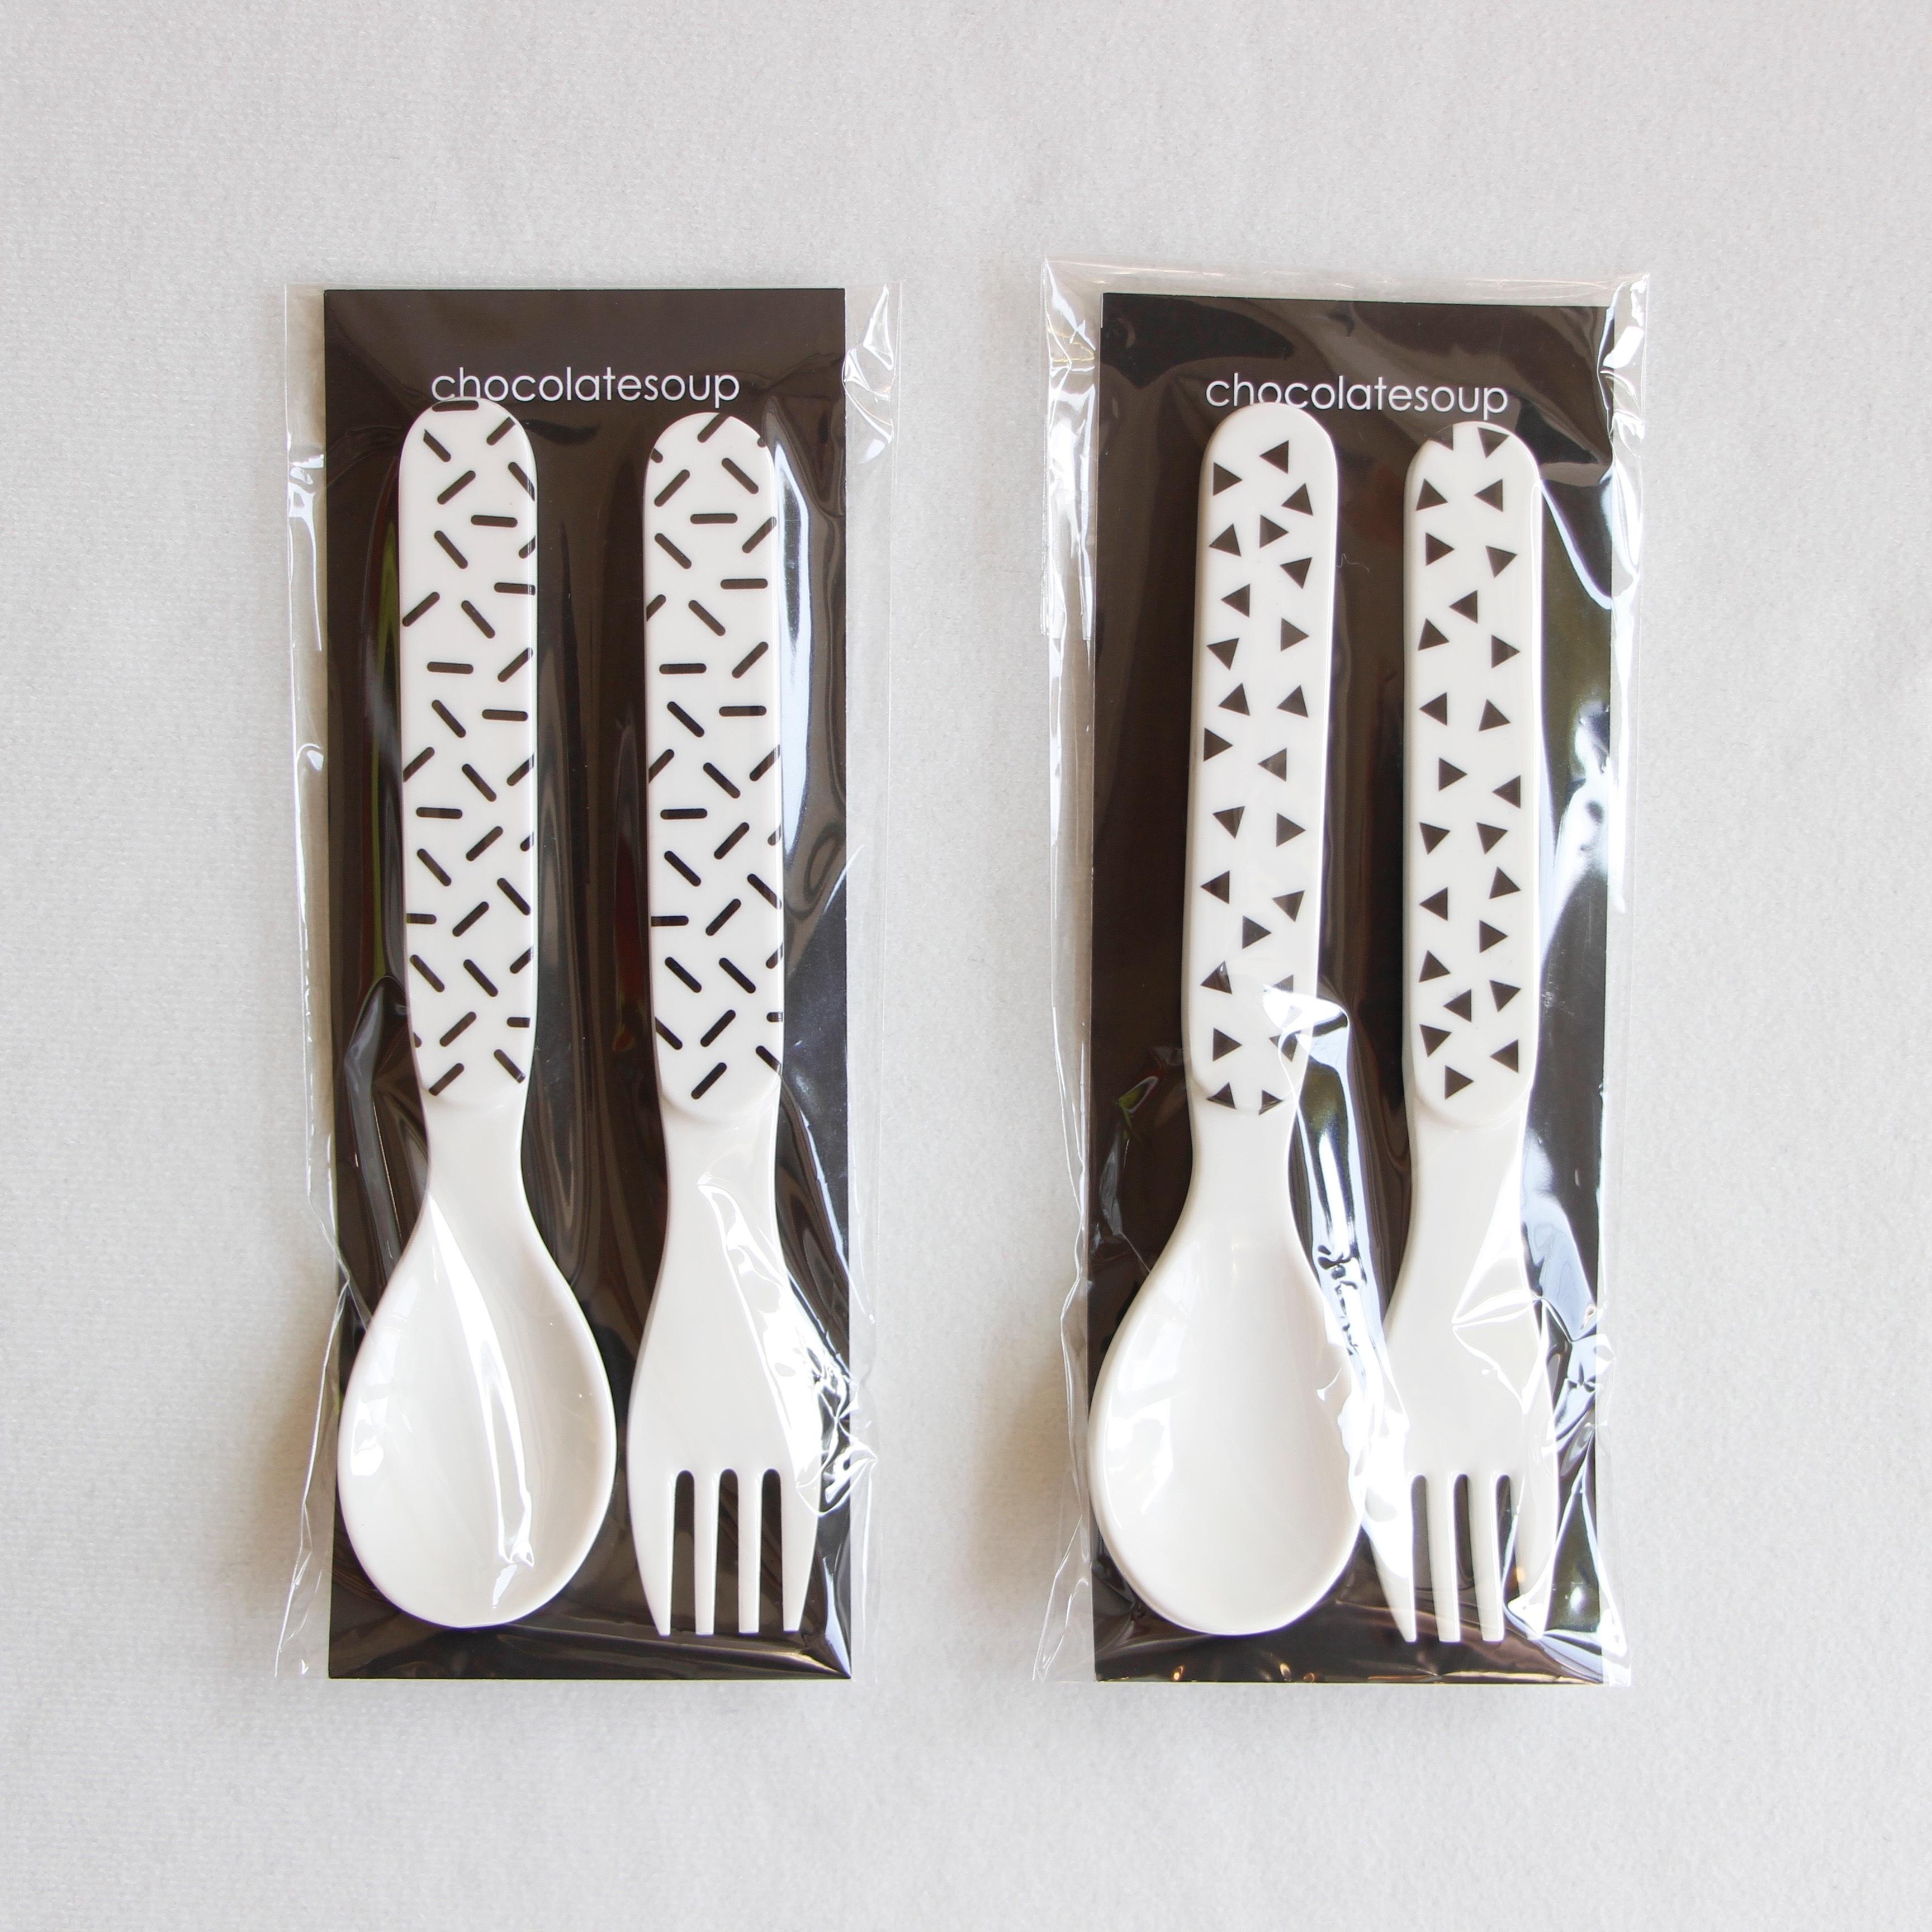 《chocolatesoup》GEOMETRY MELAMINE SPOON & FORK